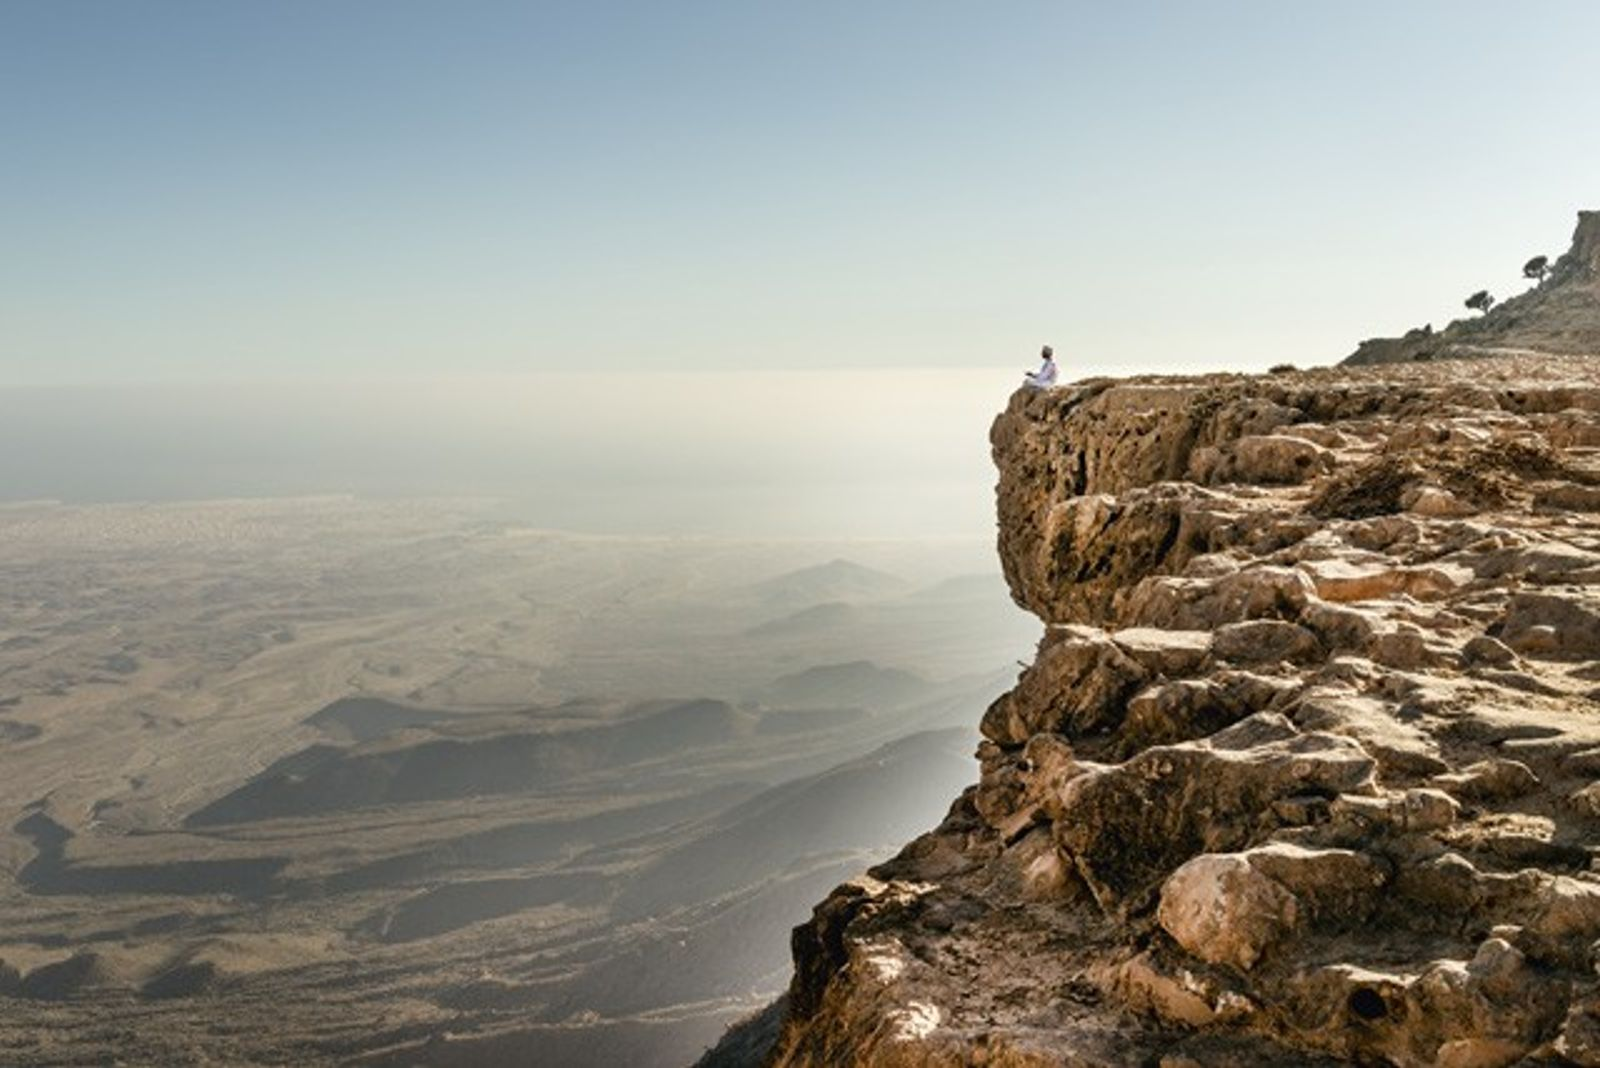 Southwest Oman: Into the Empty Quarter